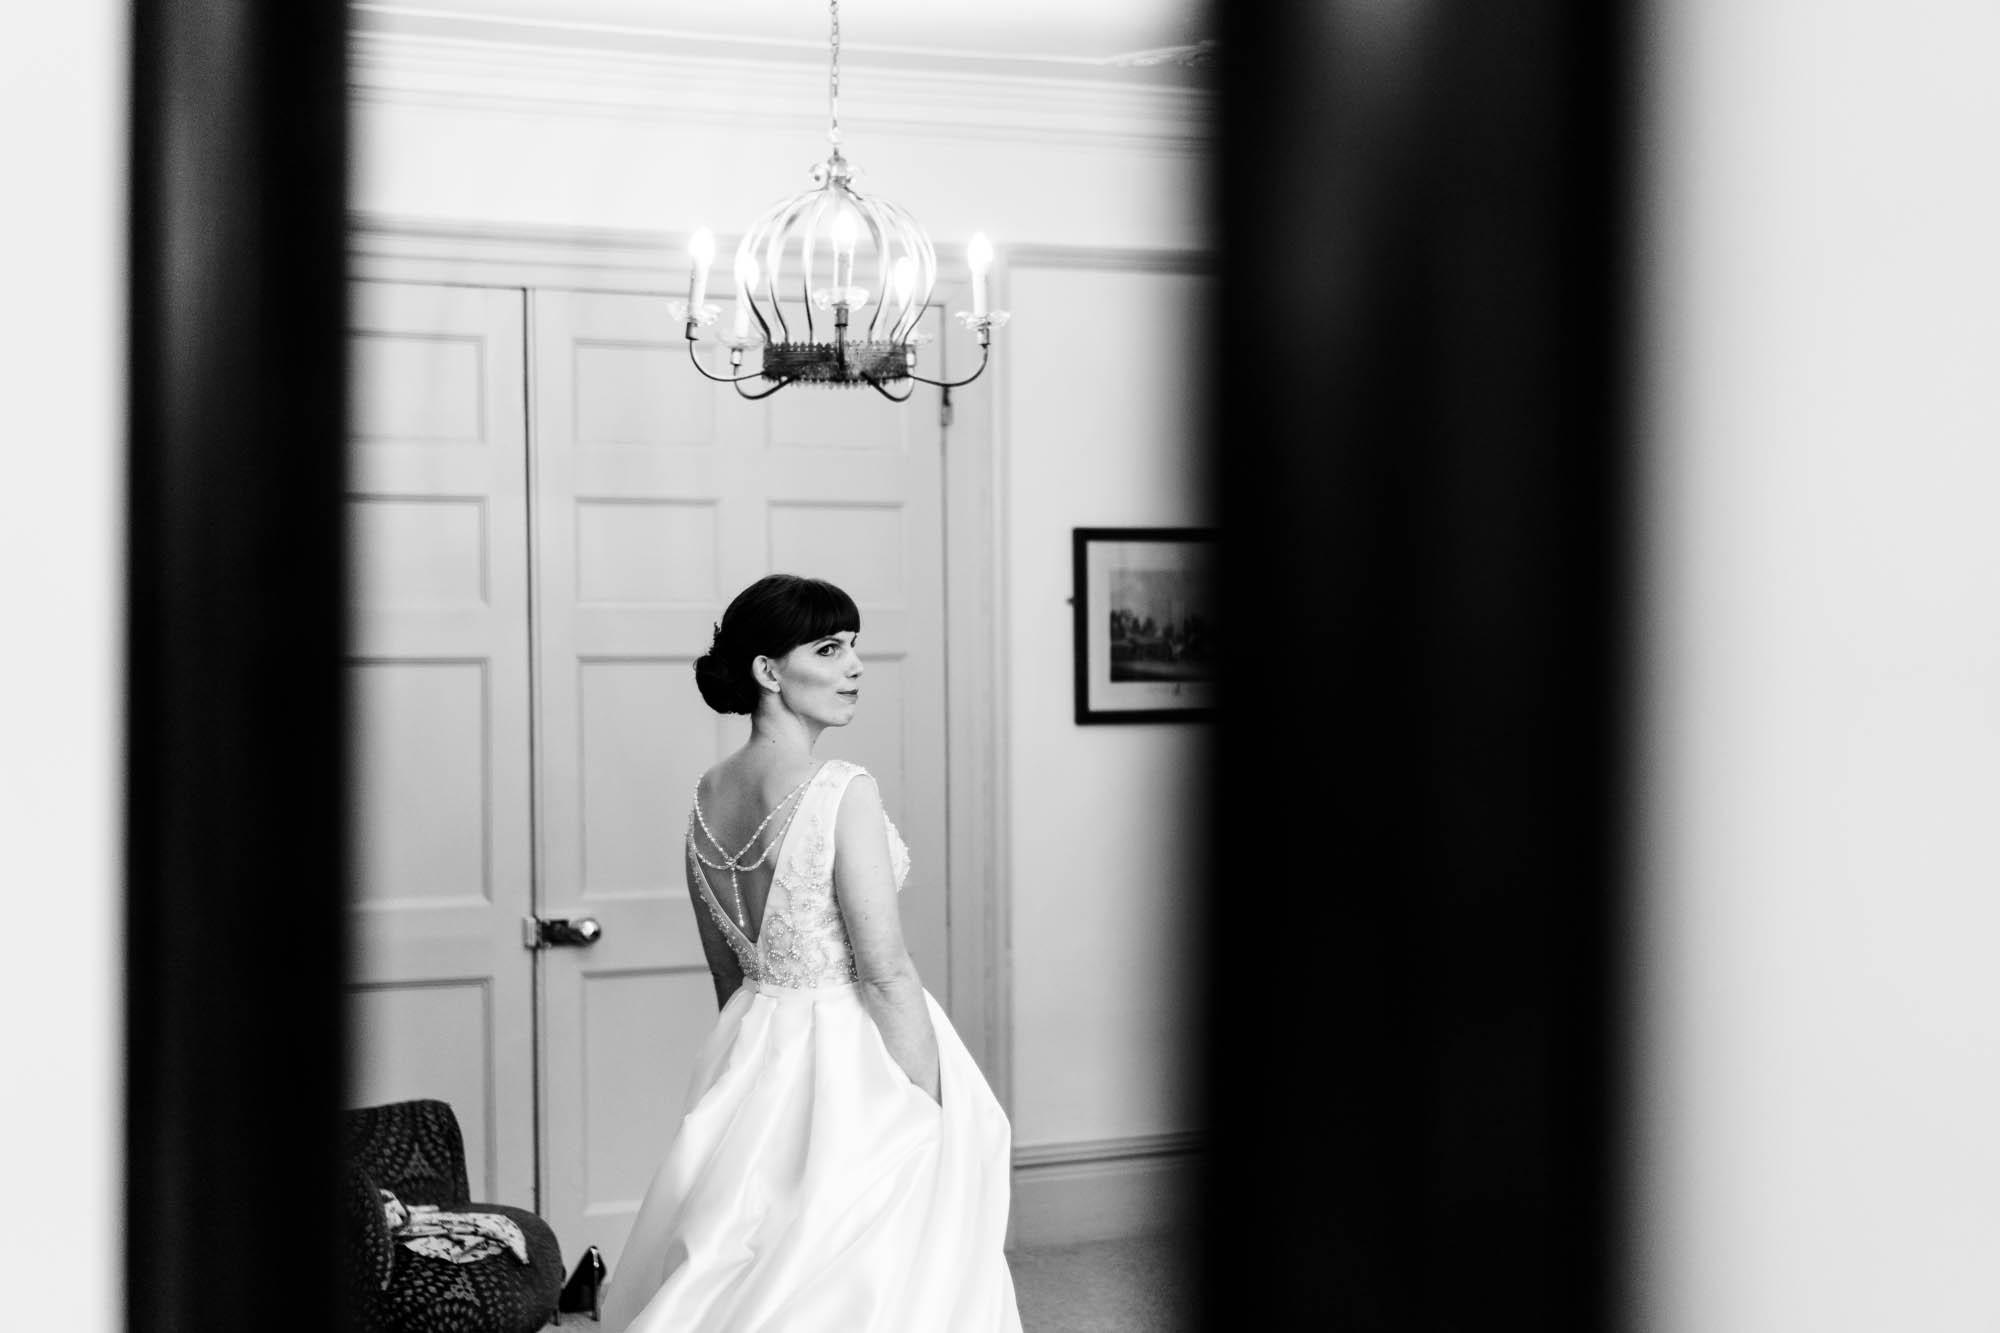 william-cecil-stamford-wedding-14